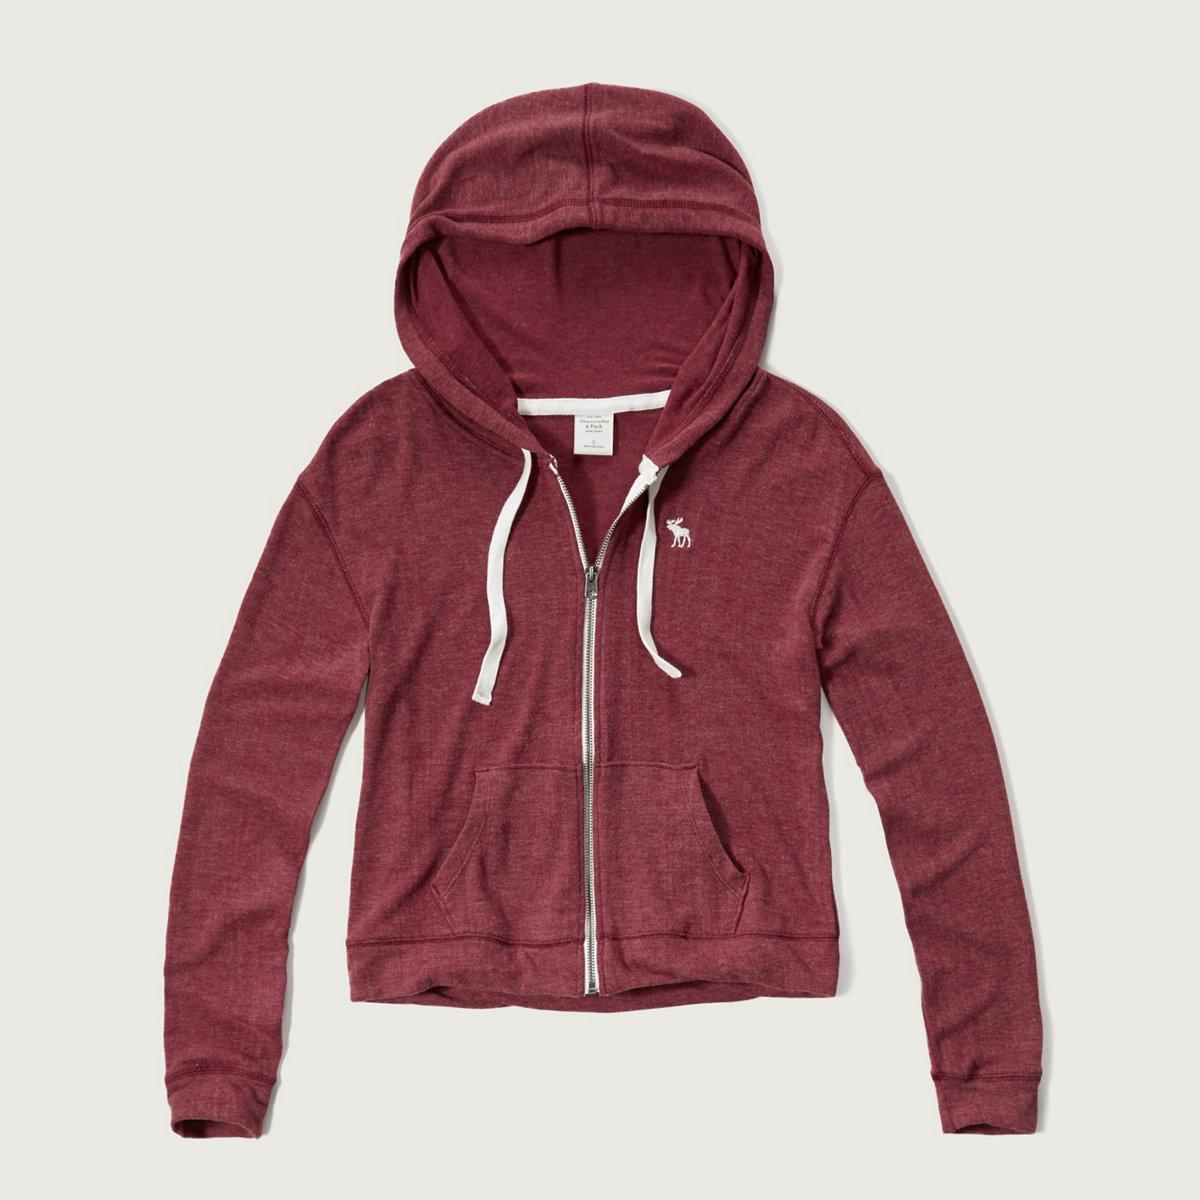 Iconic Full-zip hoodie